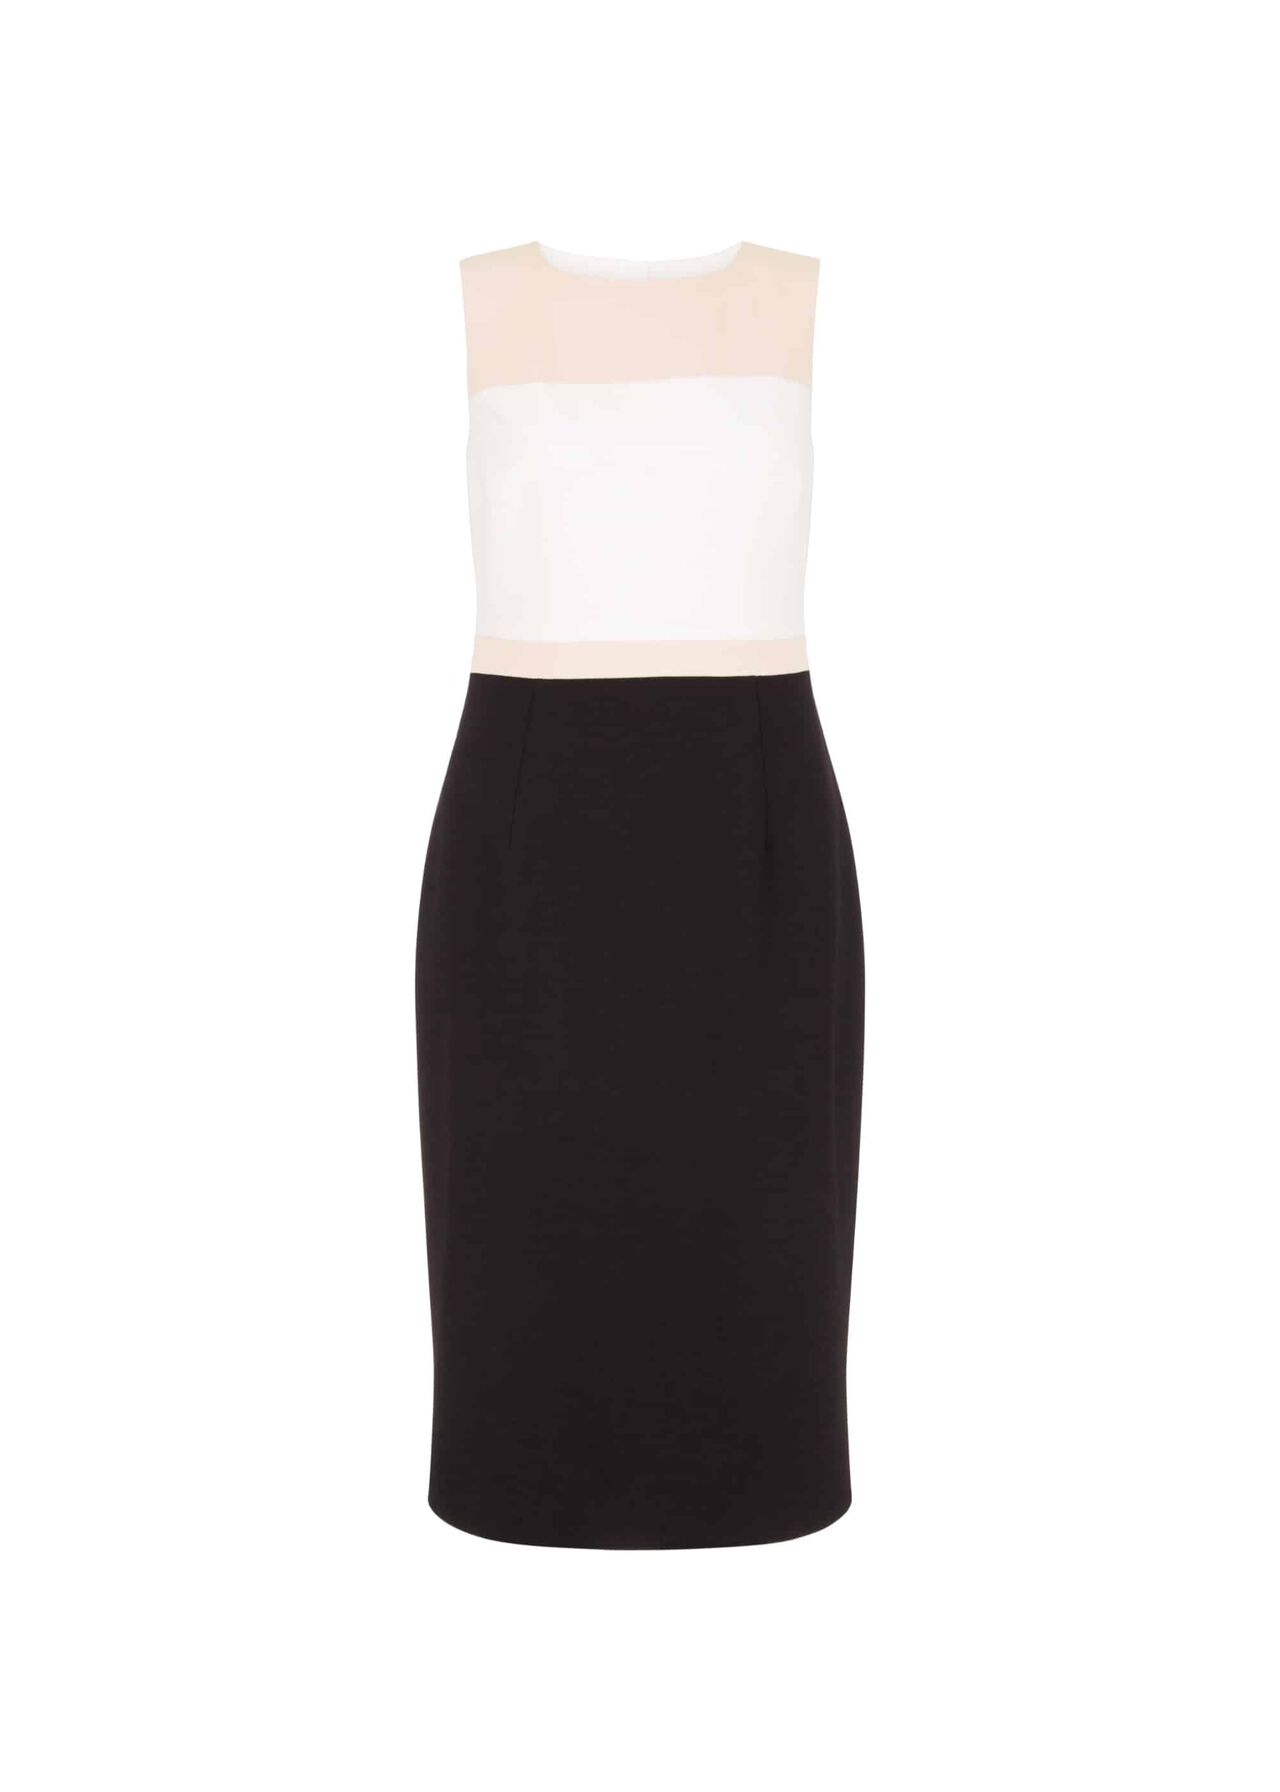 Petite Leah Dress Black Pink